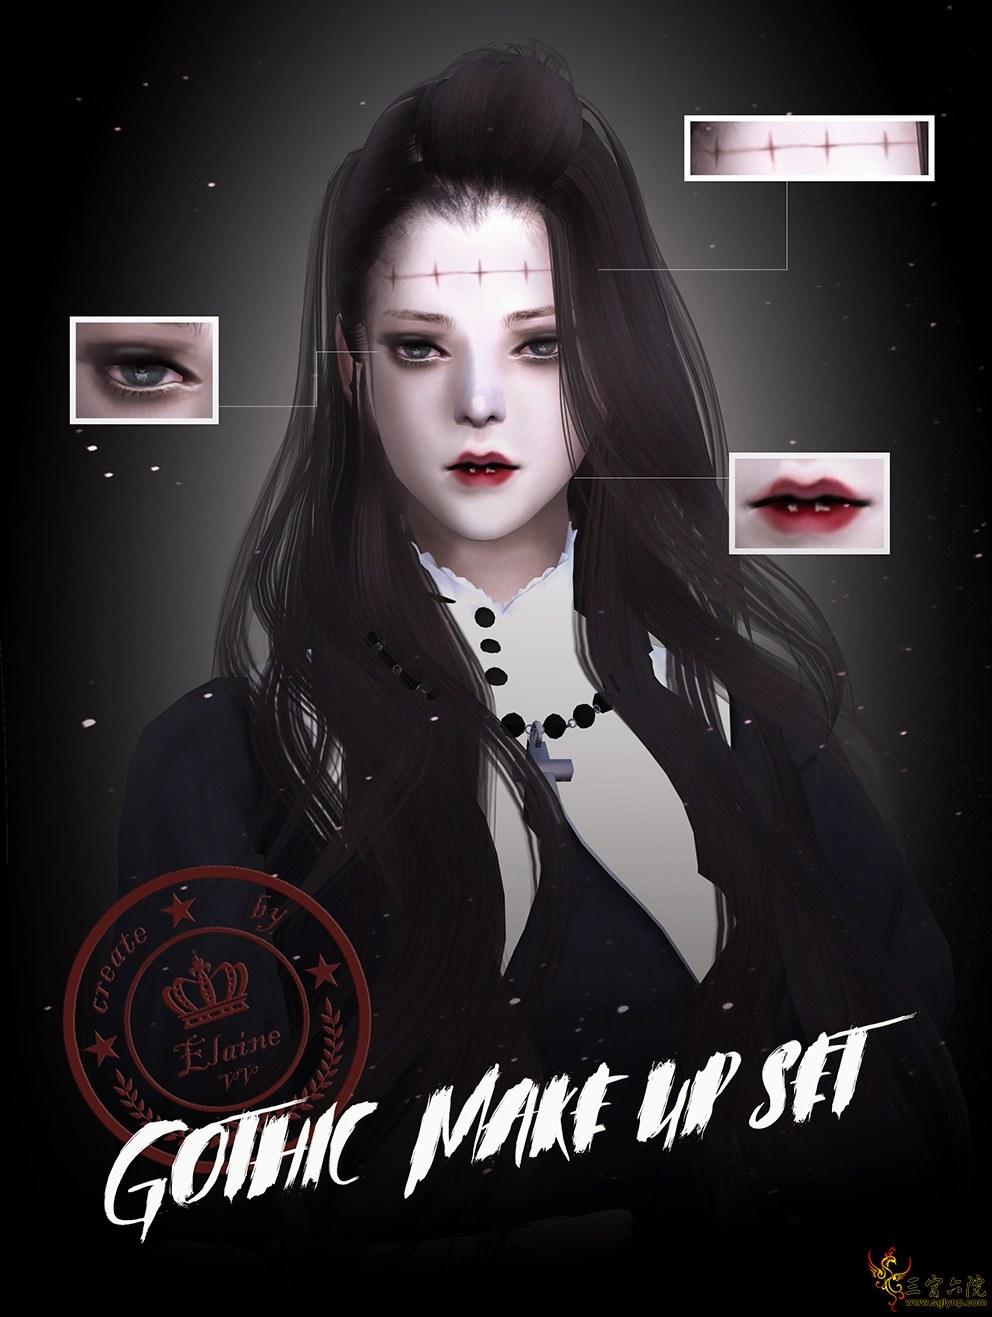 gothic make up.jpg